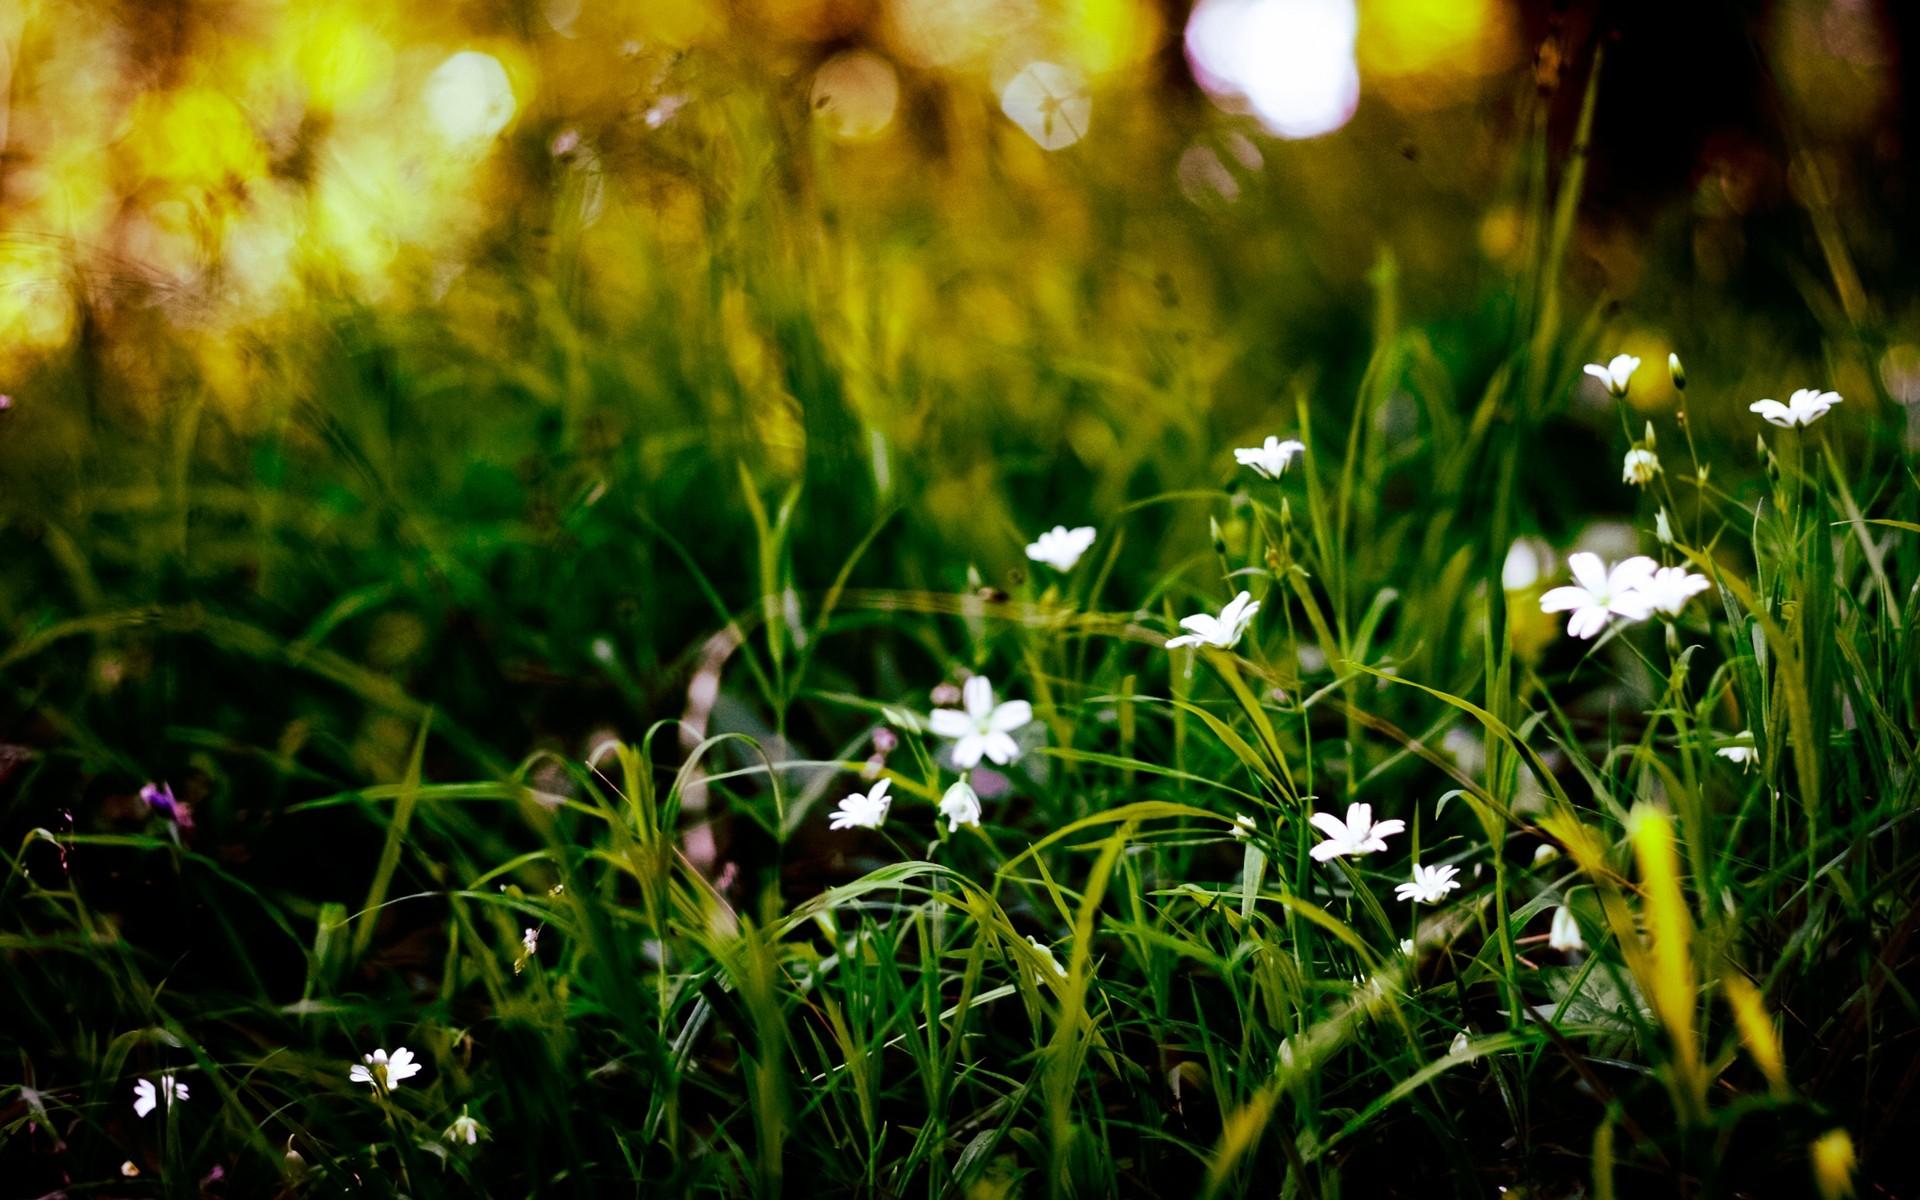 White Flowers In Grass 18 Background Wallpaper Hdflowerwallpaper